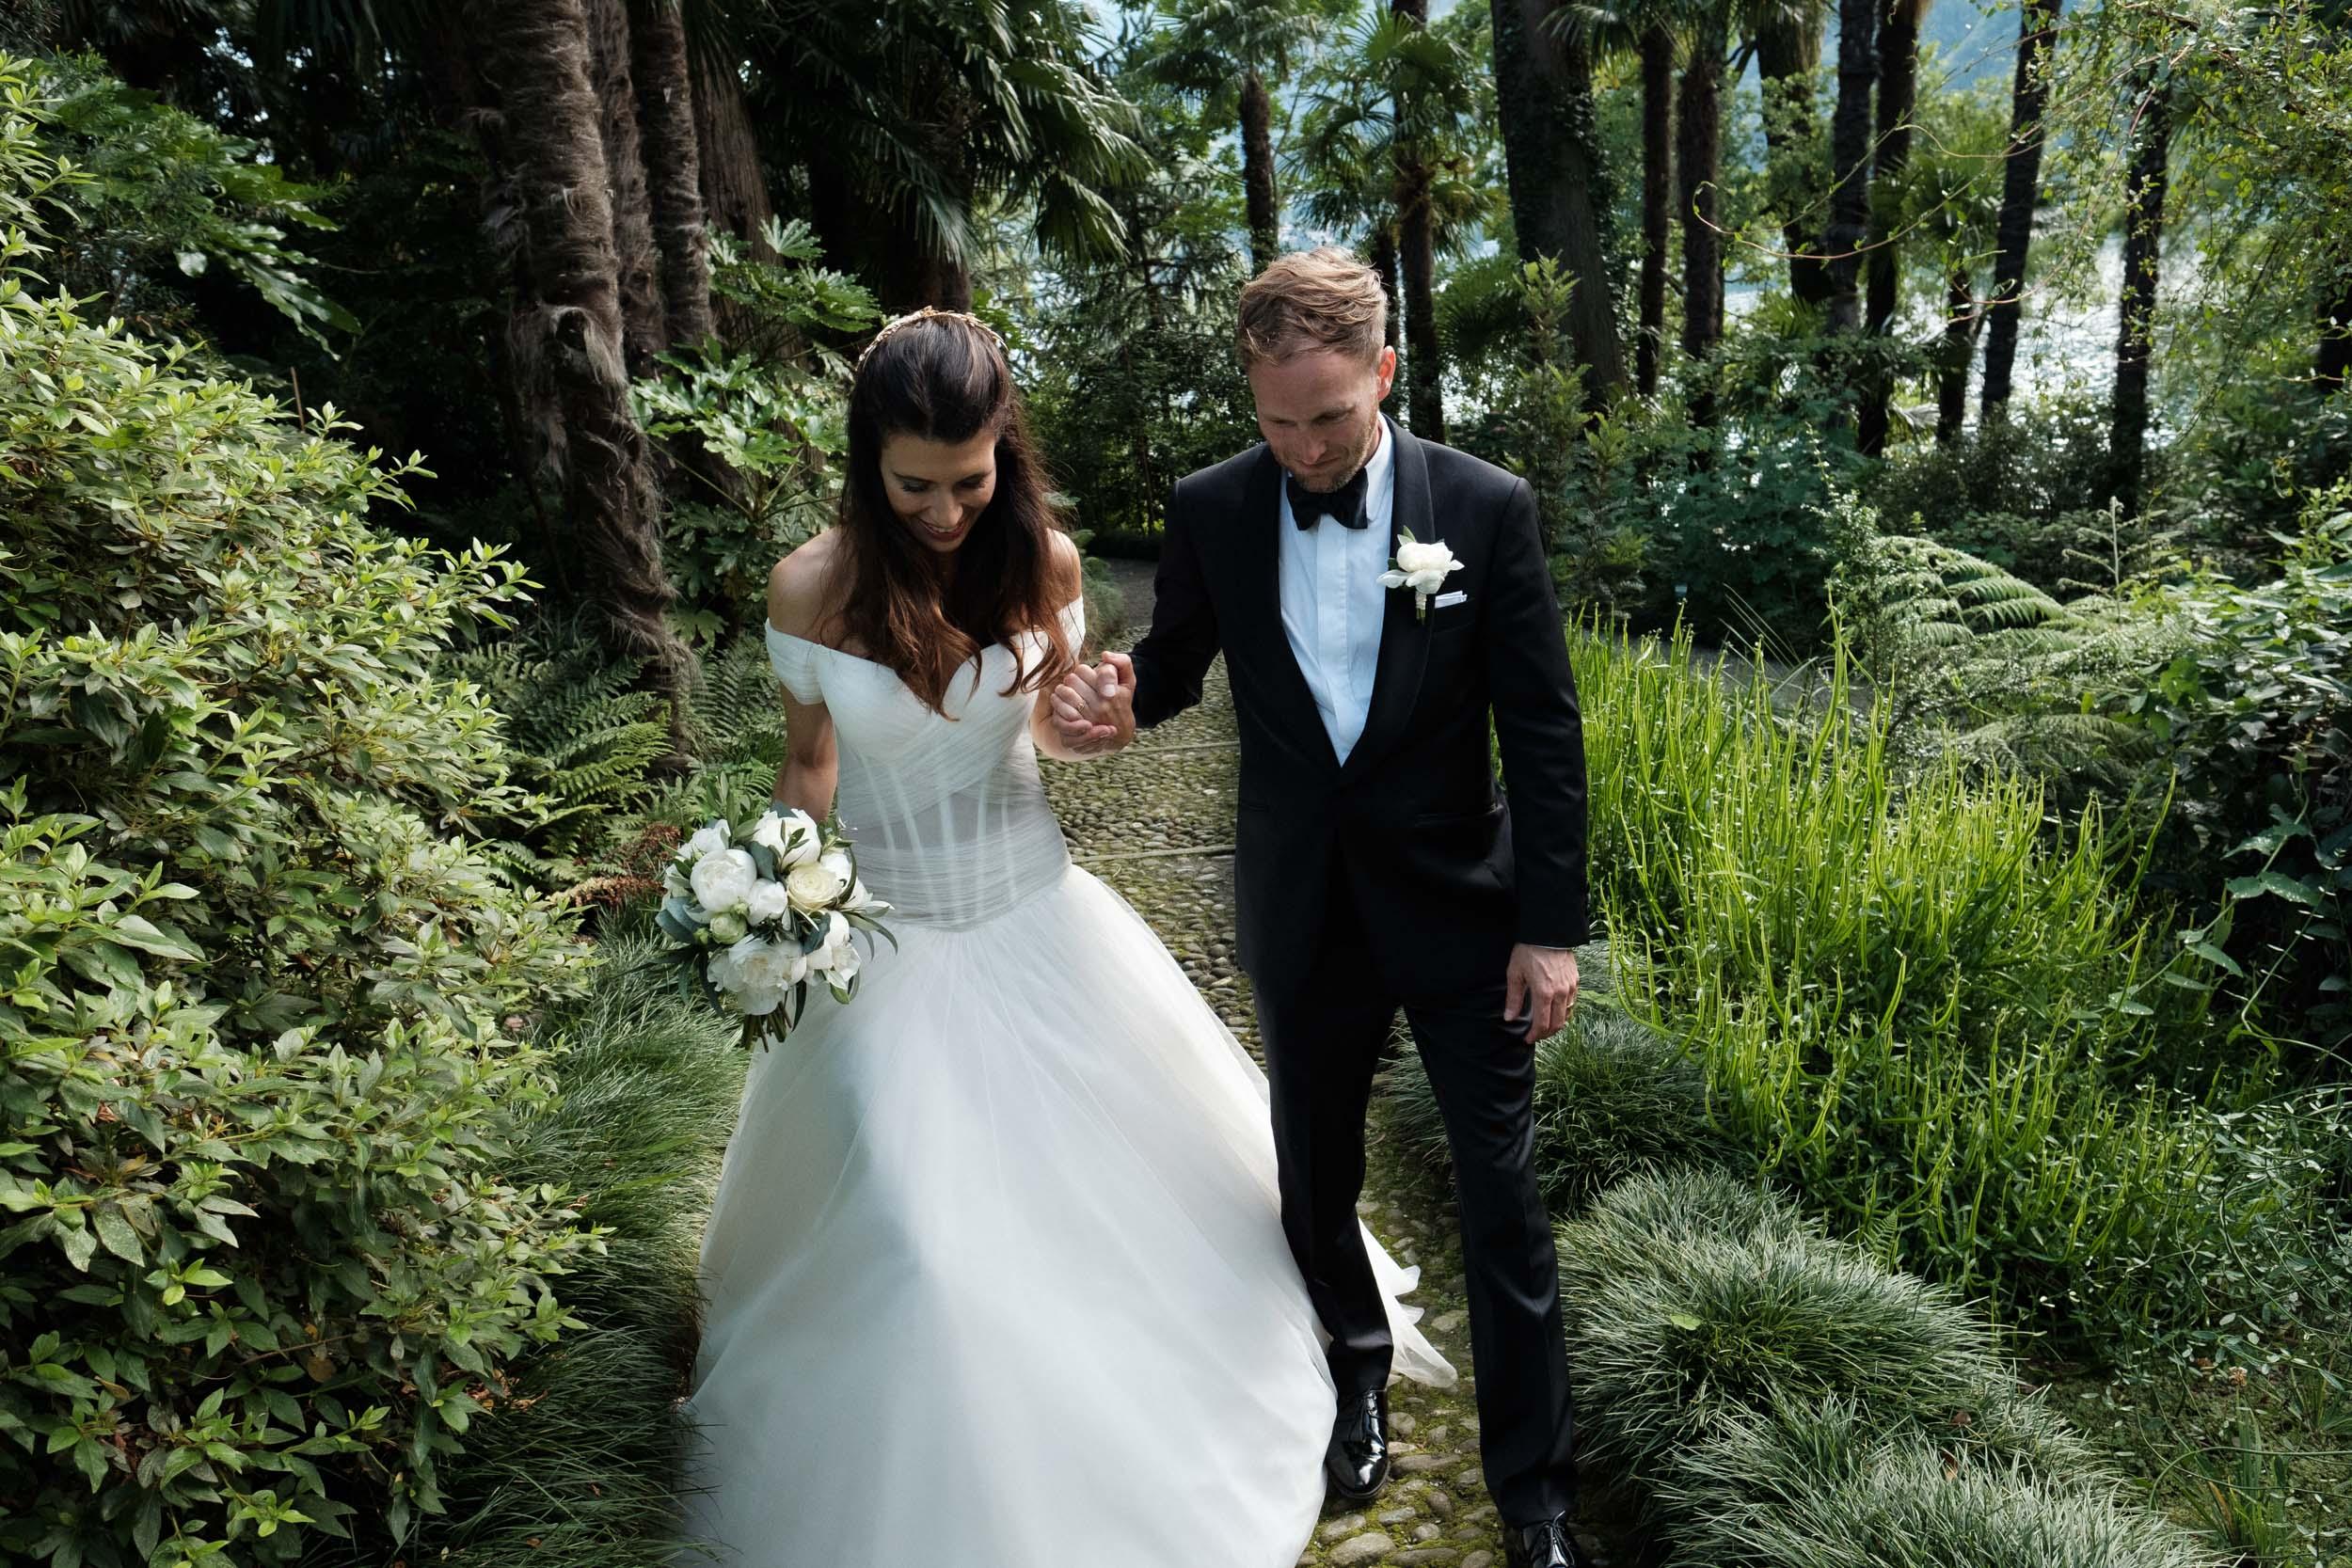 olivia-andreas-wedding-switzerland-410.jpg